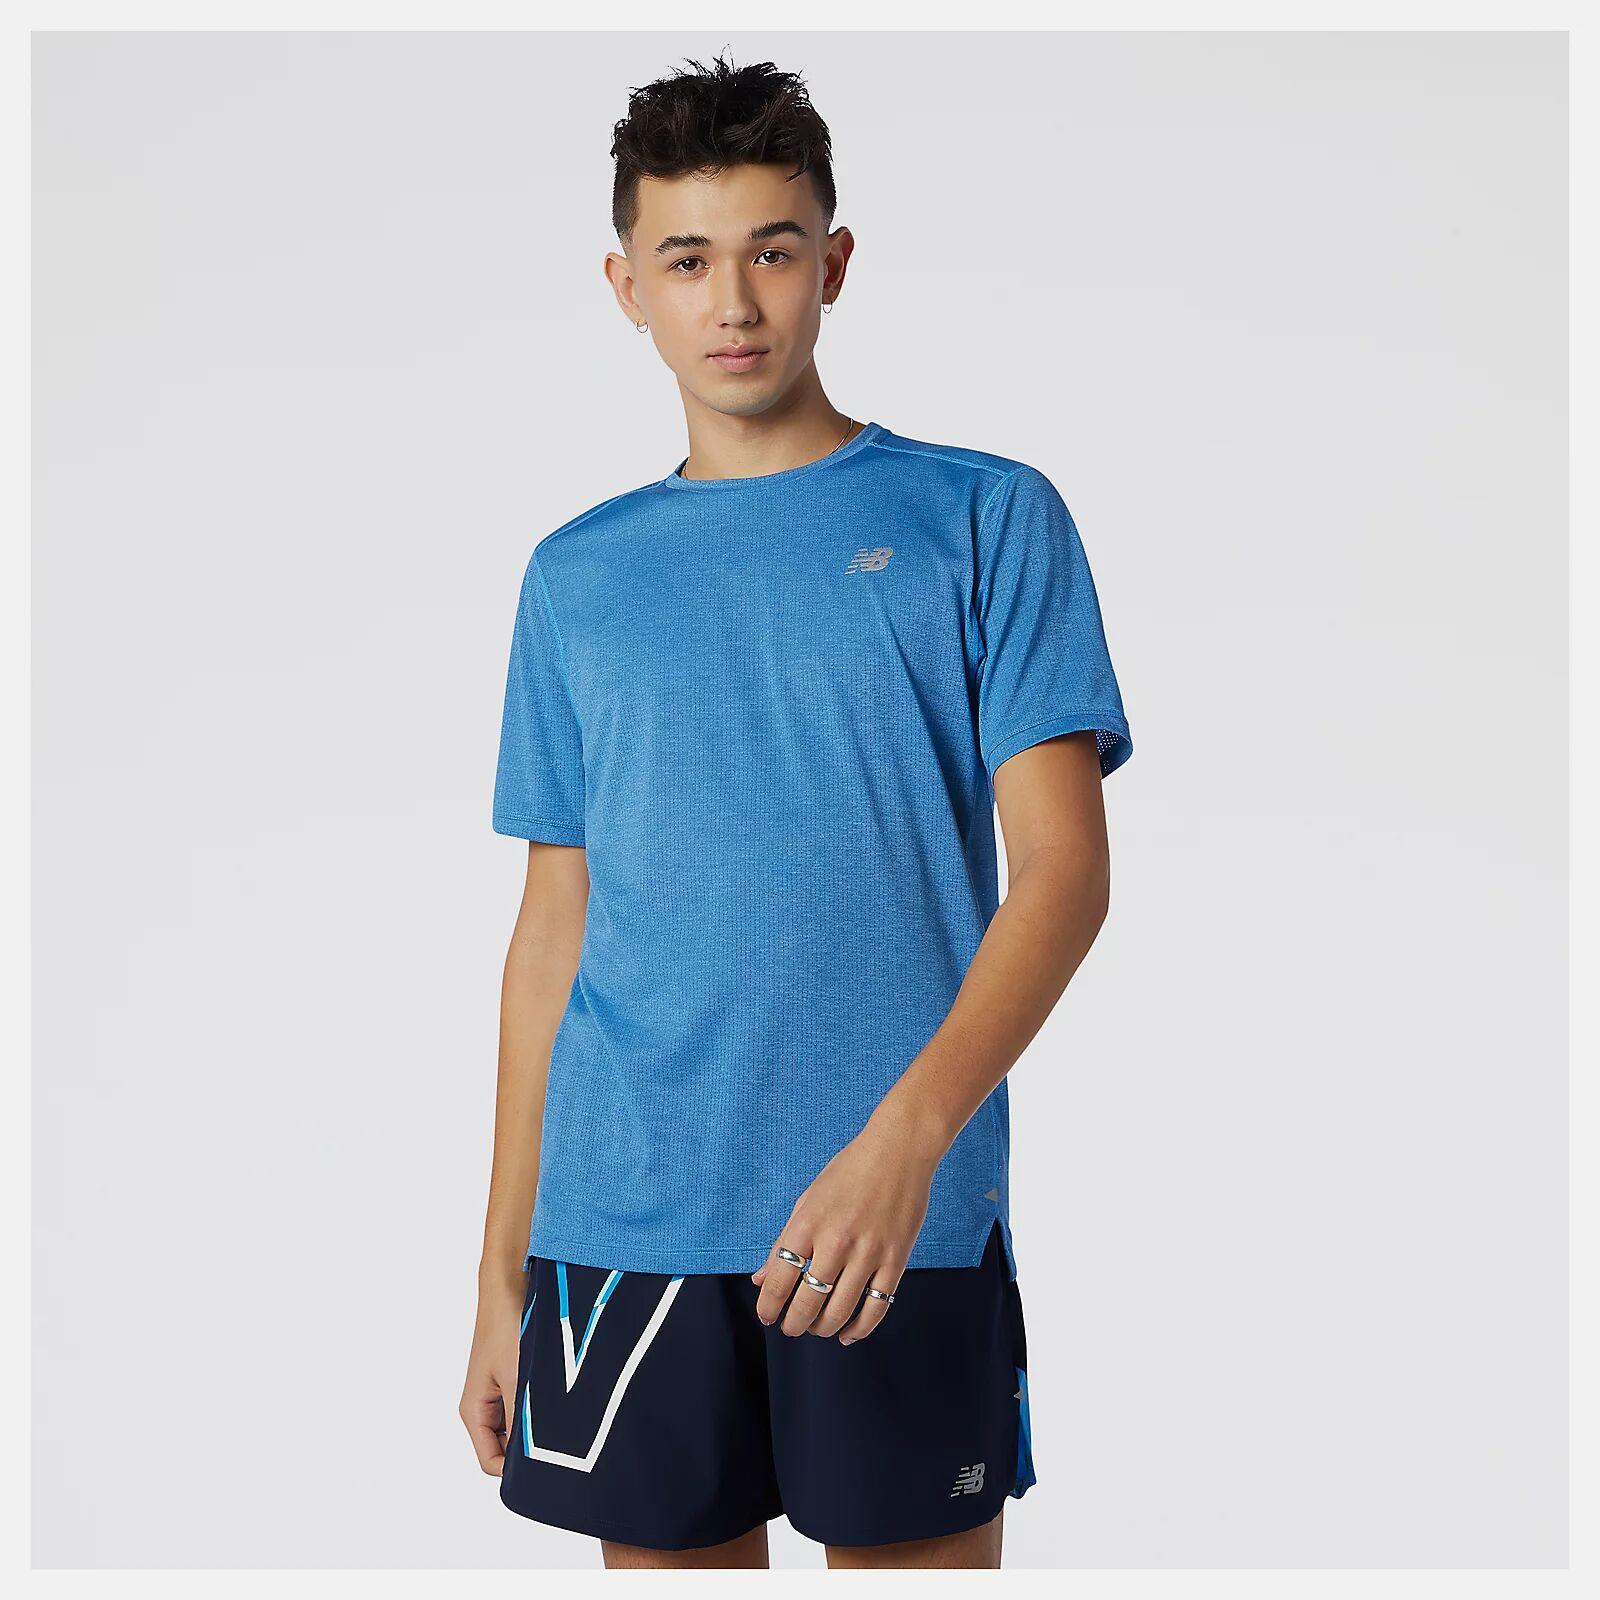 New Balance Impact Run Short Sleeve (Blau)